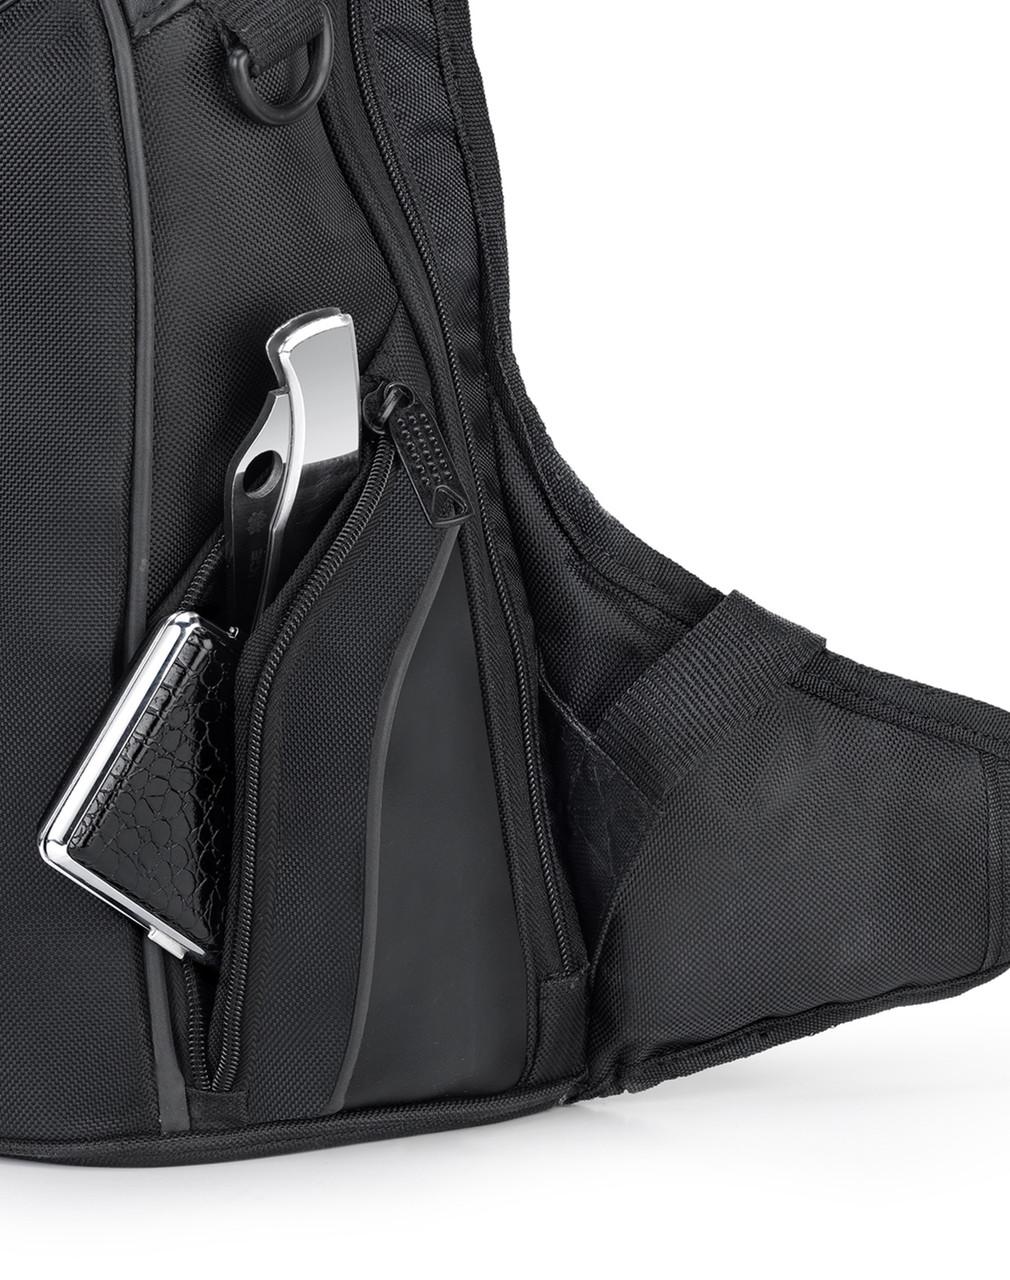 VikingBags AXE Medium Motorcycle Backpack Front Pocket